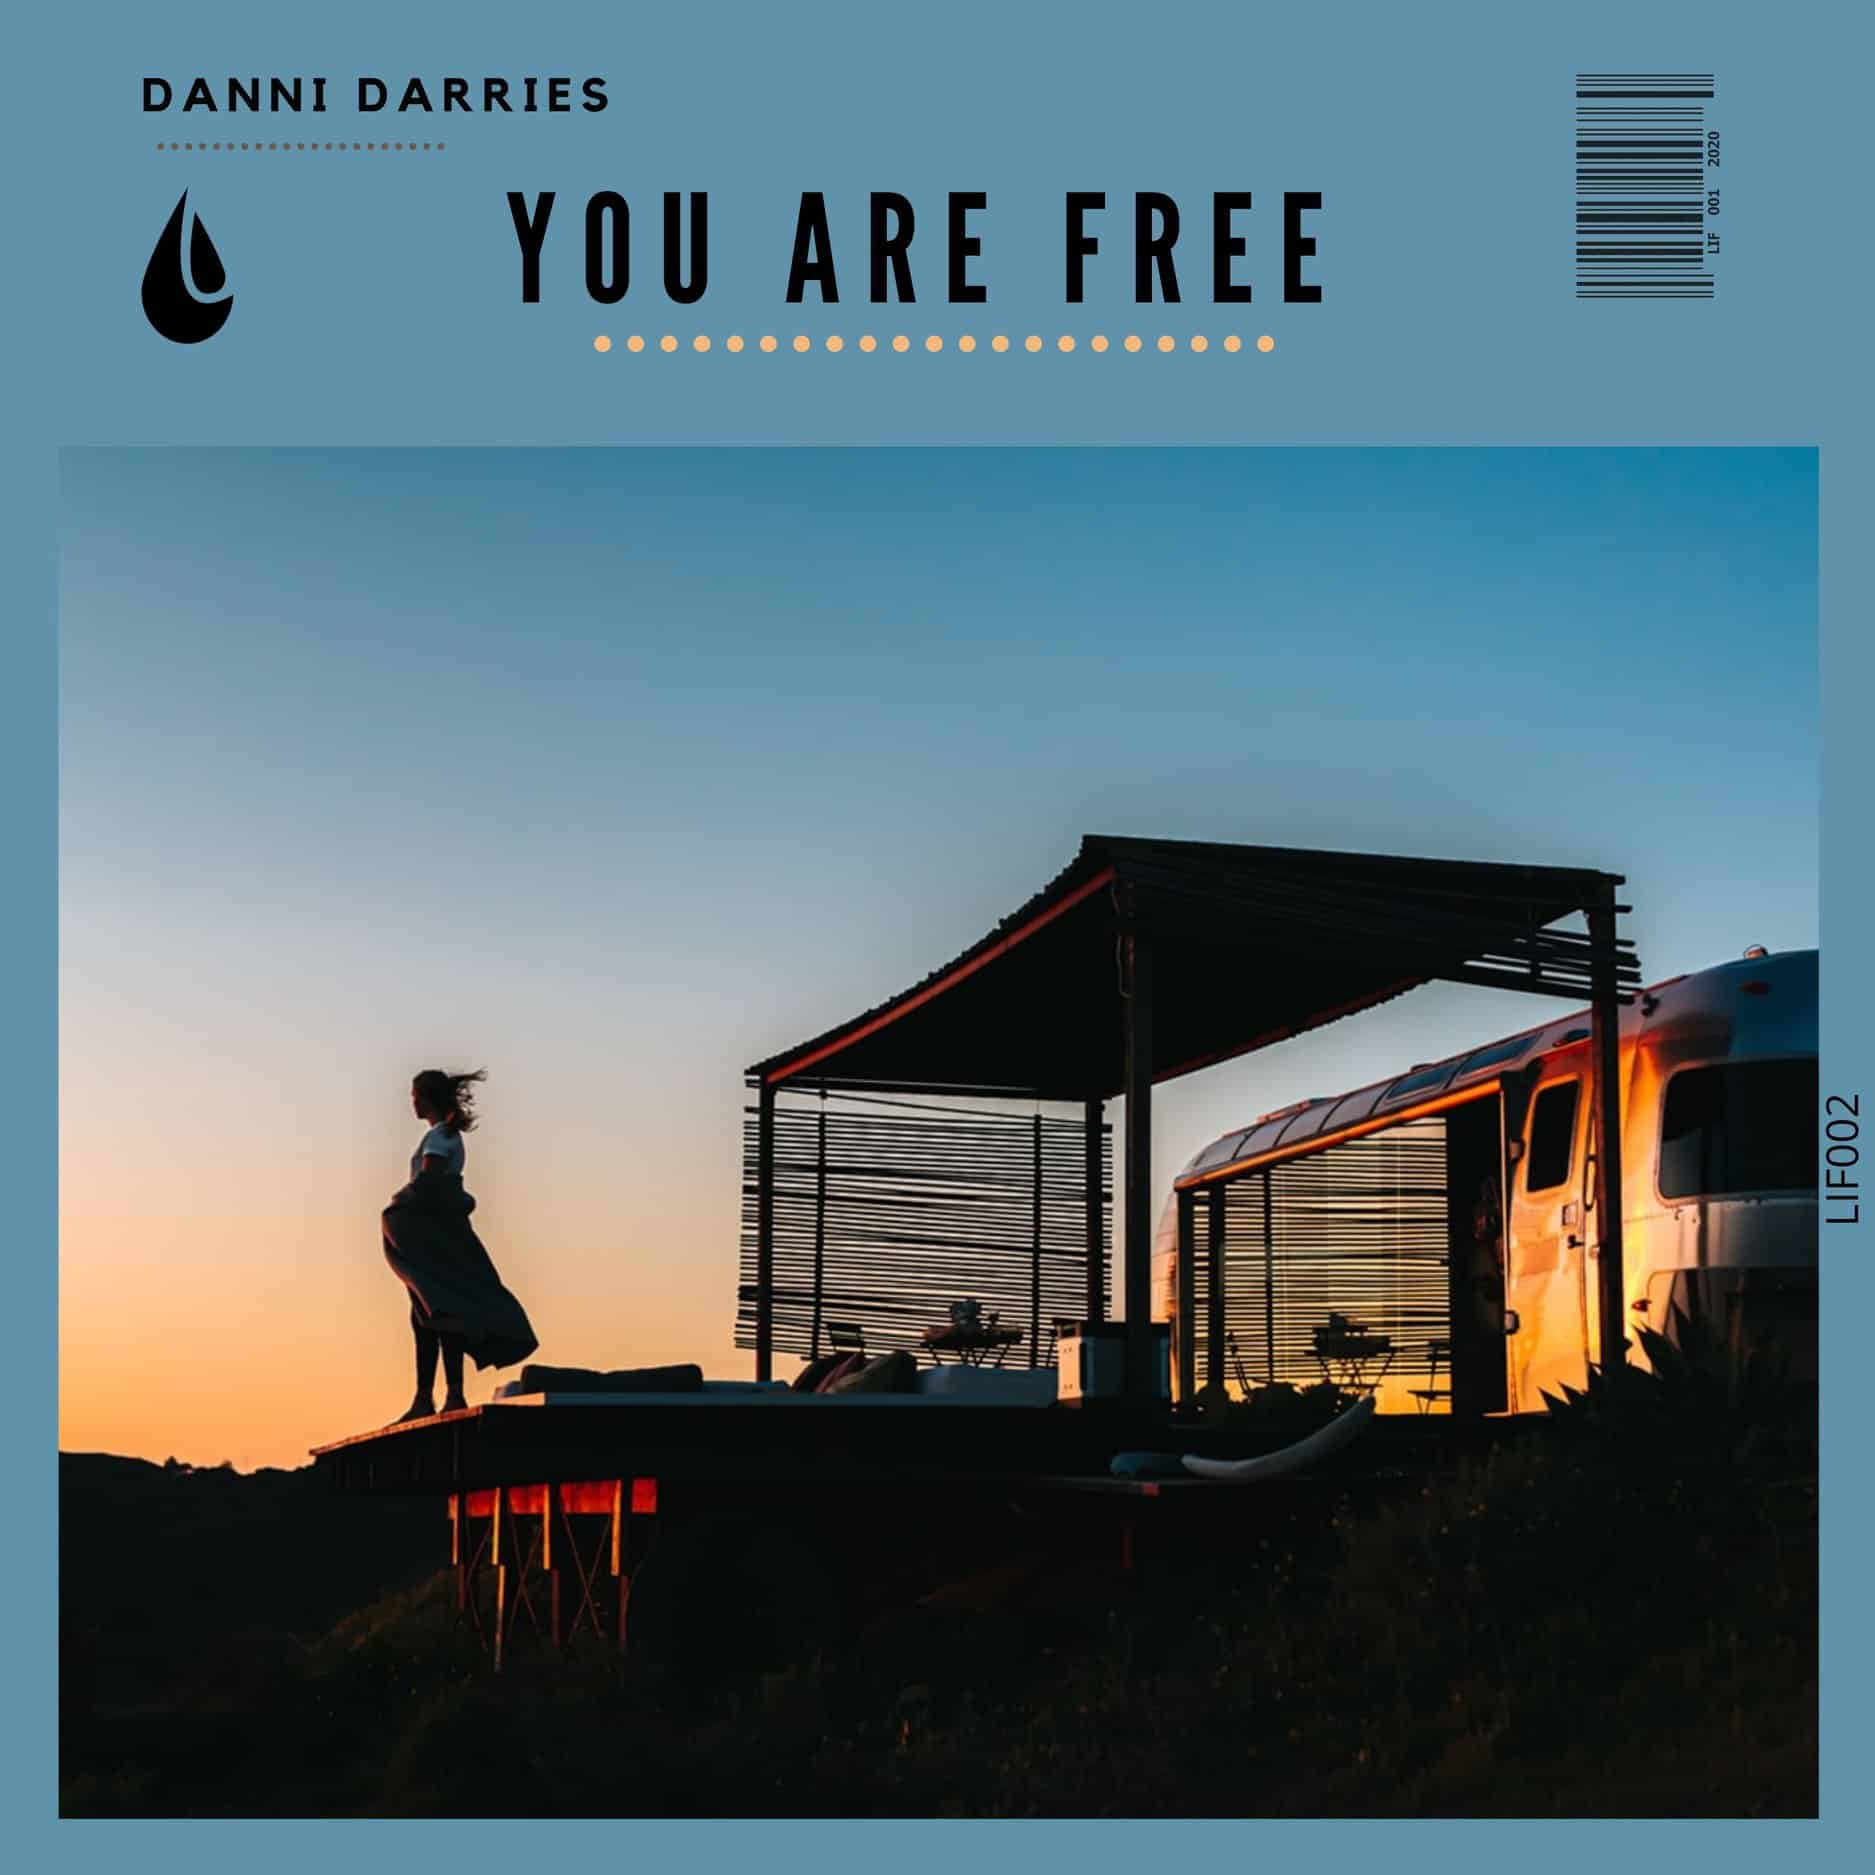 Danni Darries